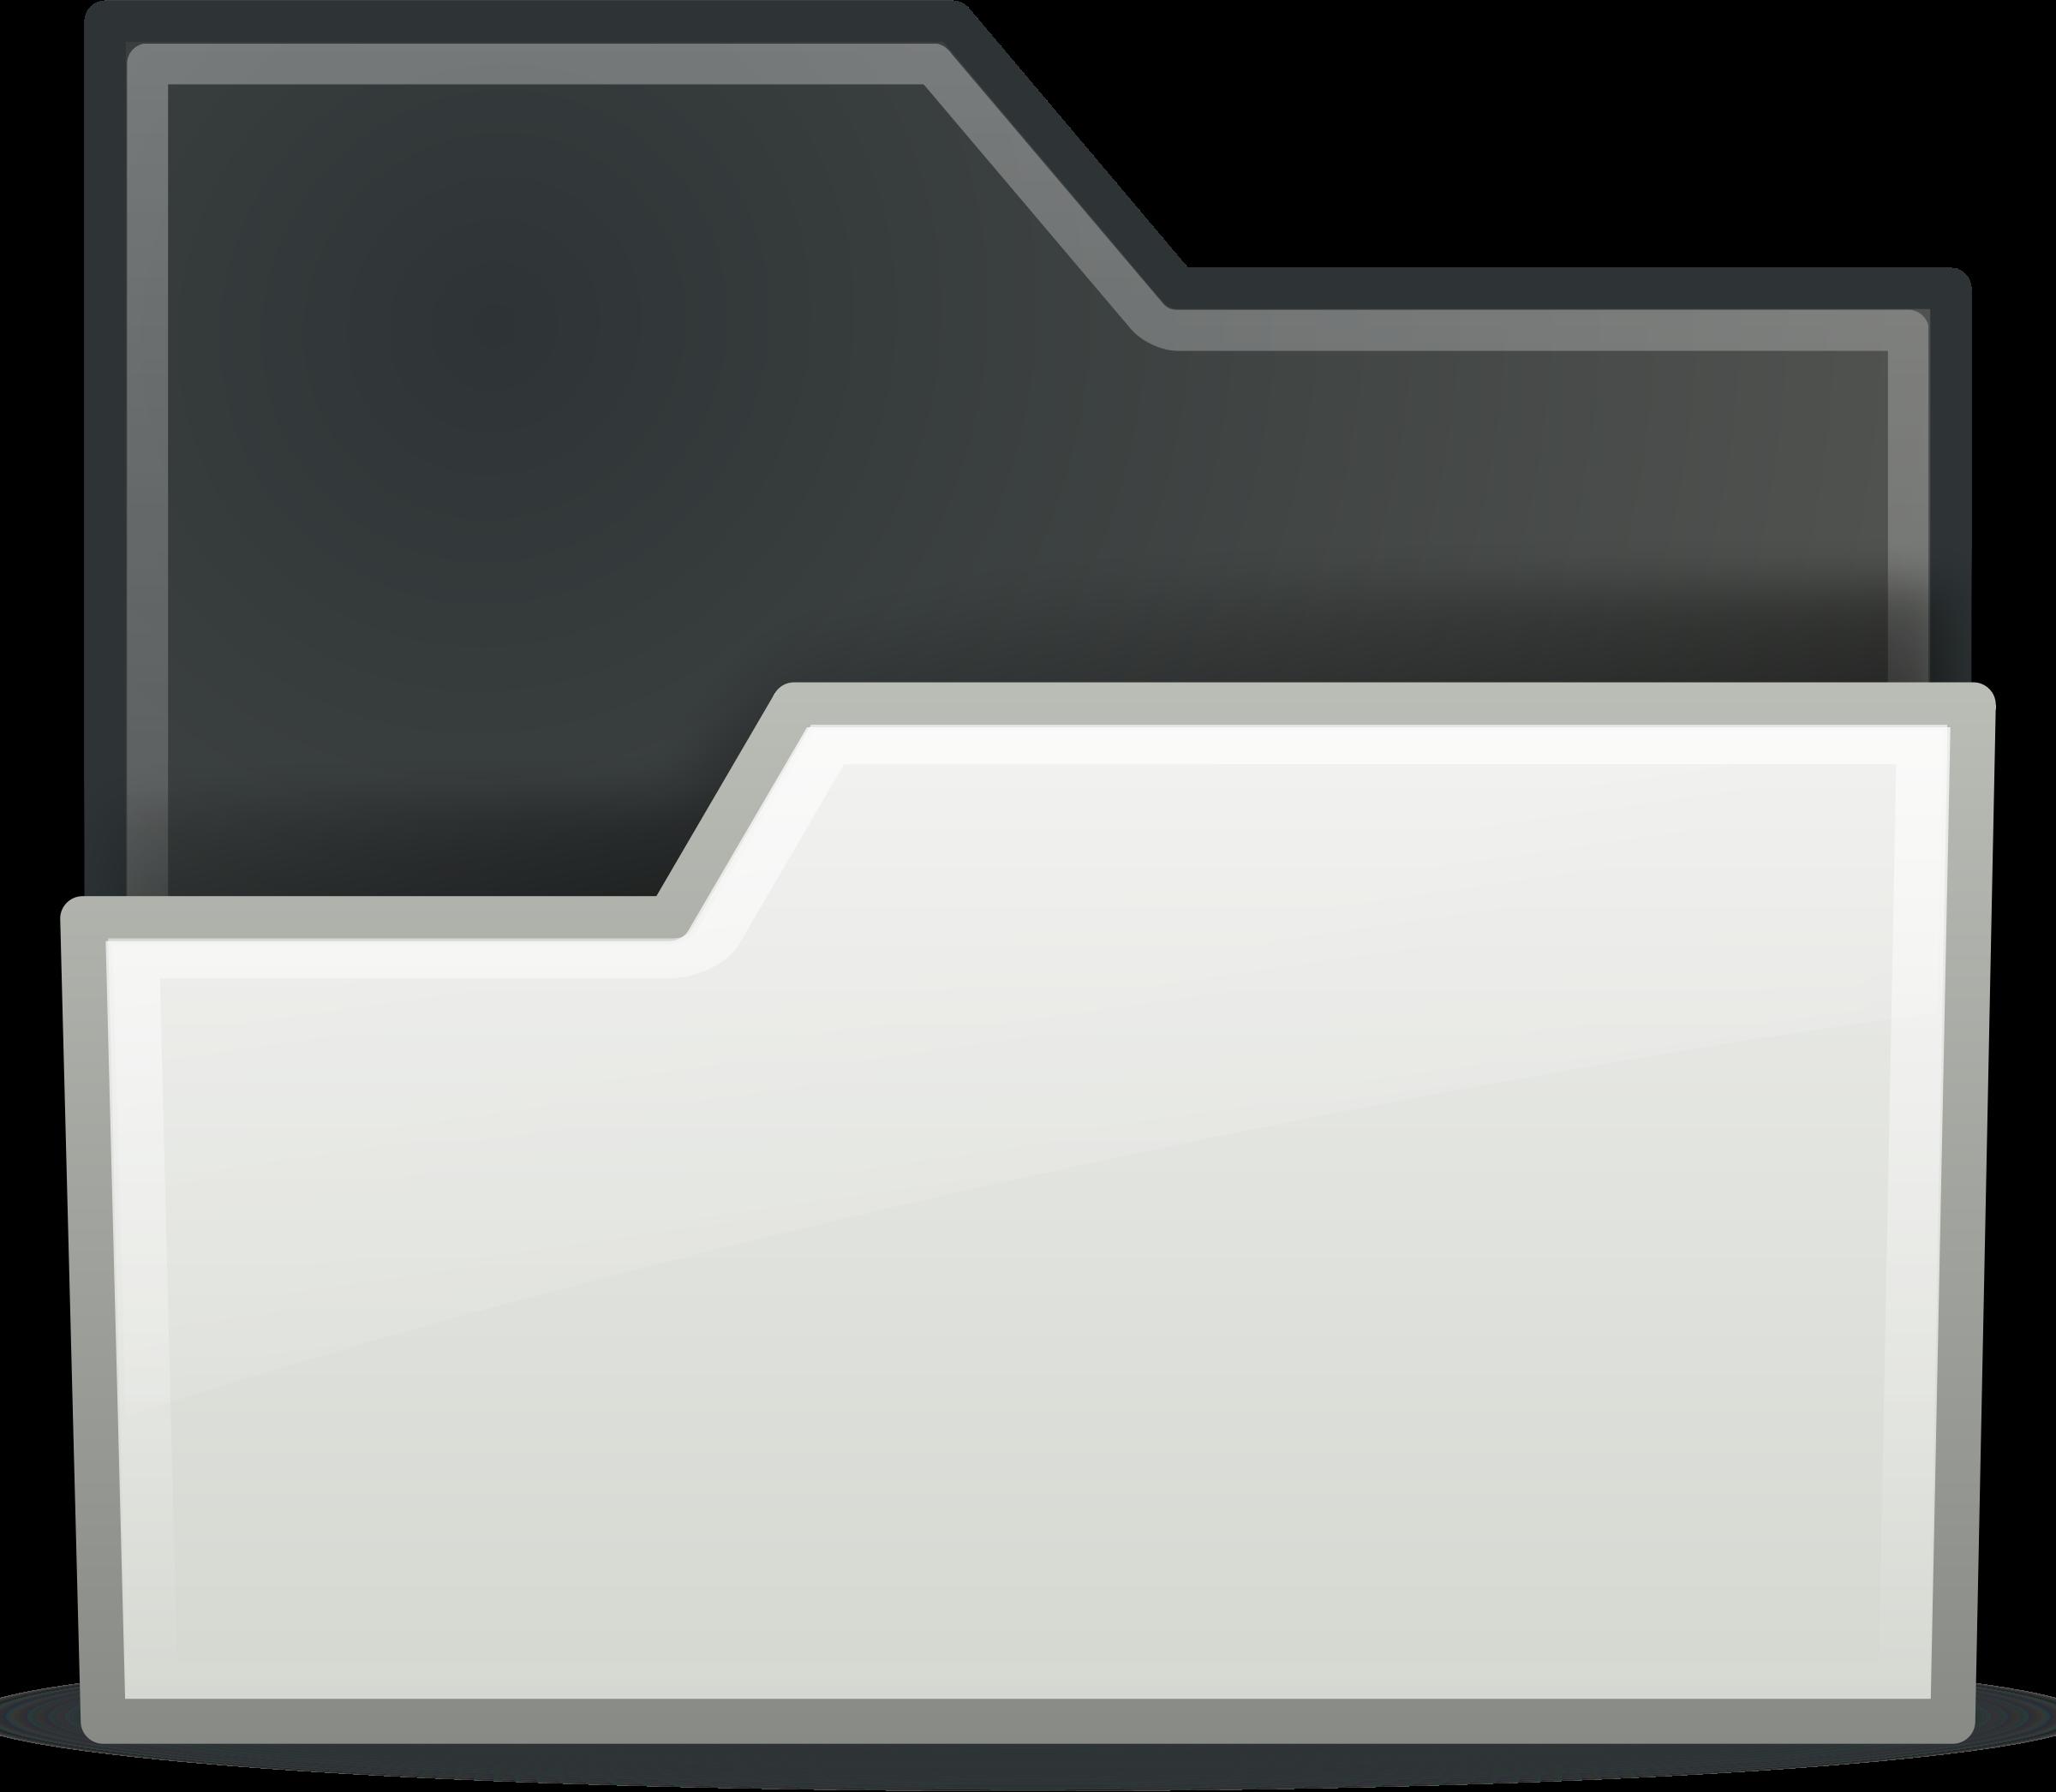 Open big image png. White clipart folder